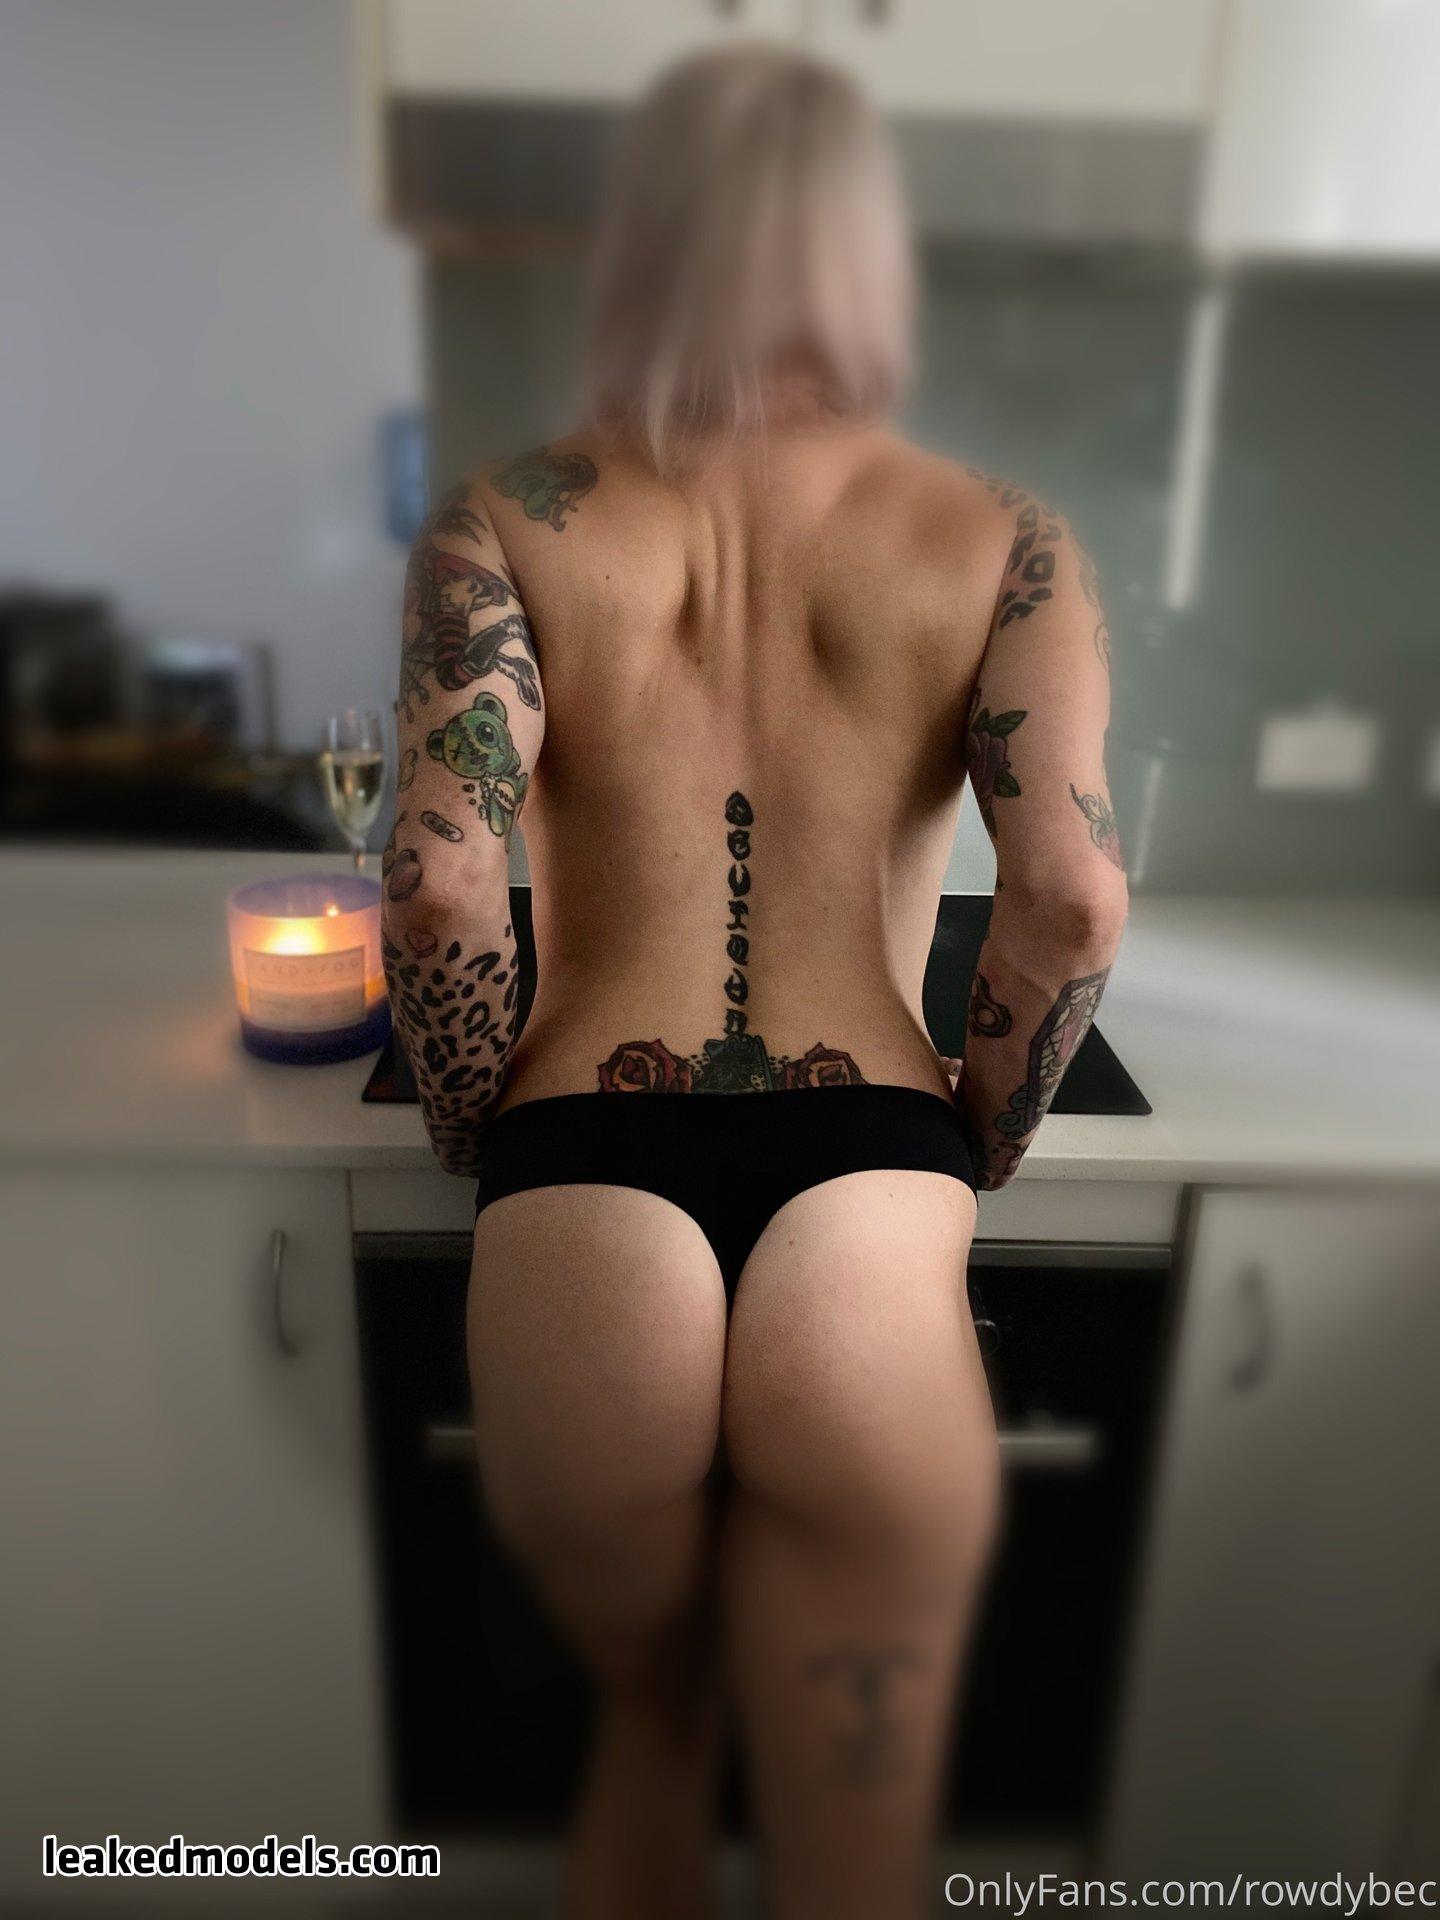 Rowdy Rawlings – rowdybec OnlyFans Nude Leaks (43 Photos)